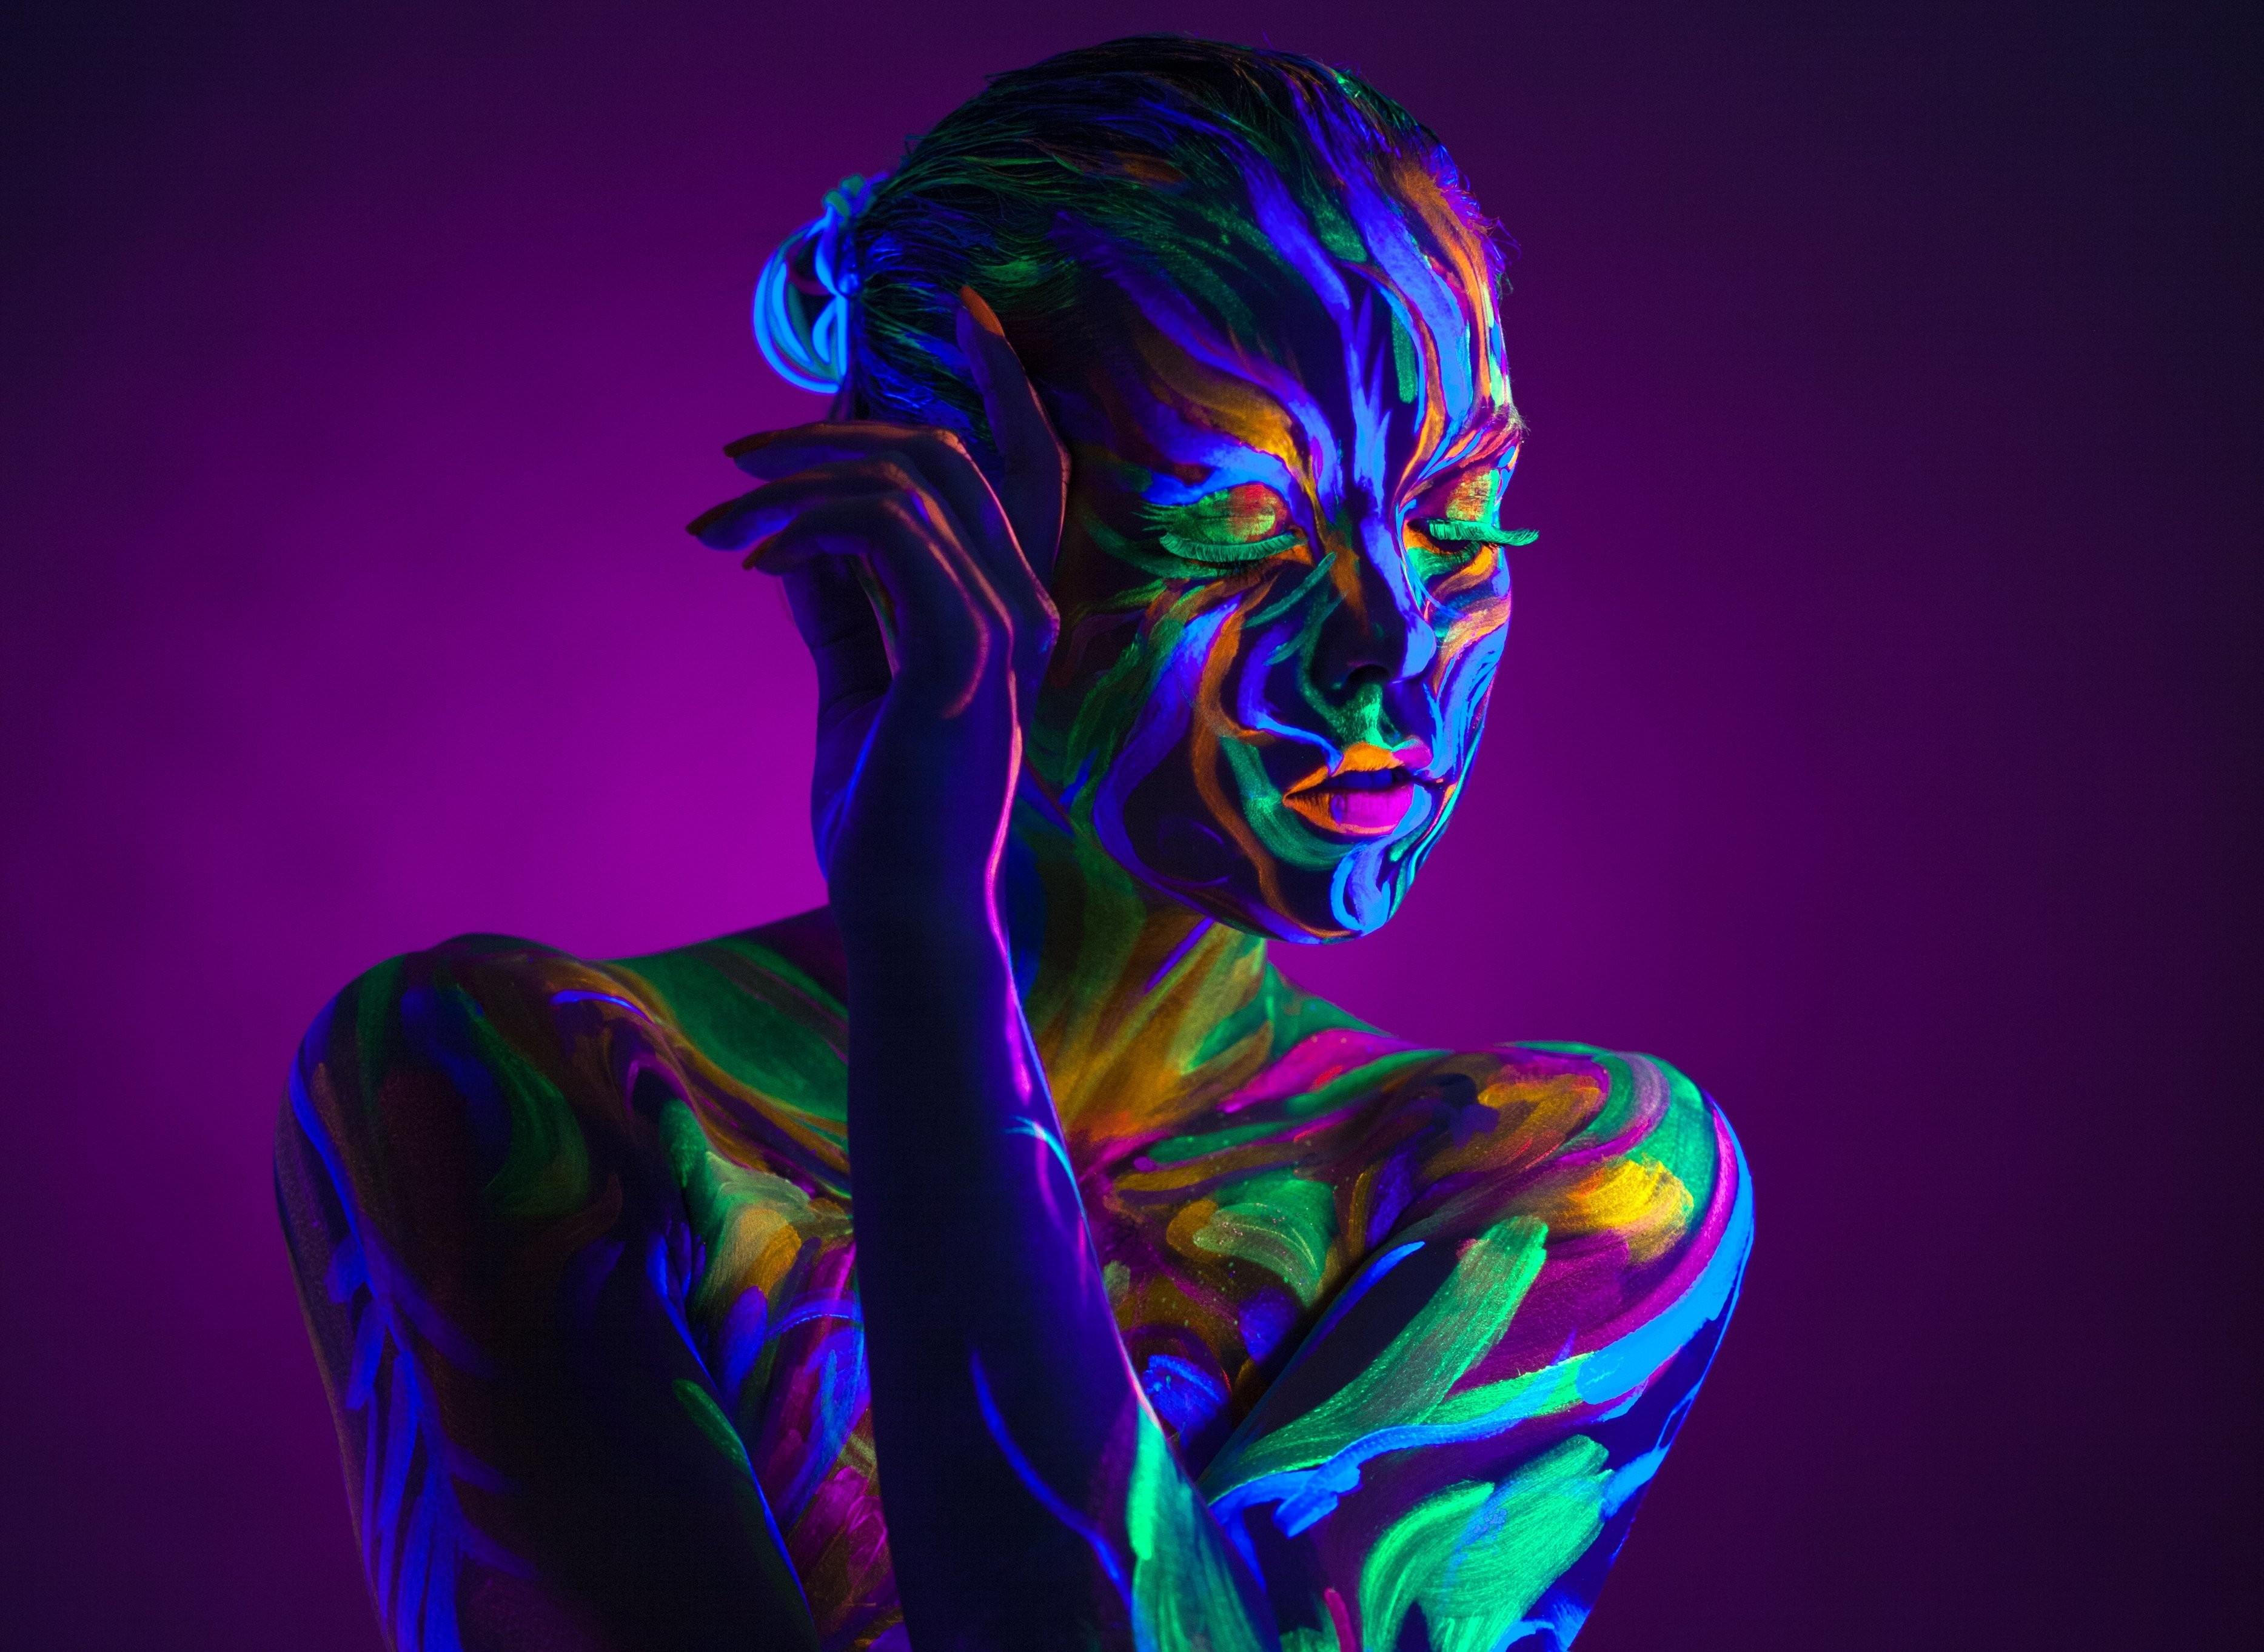 Neon Glow Body Paints